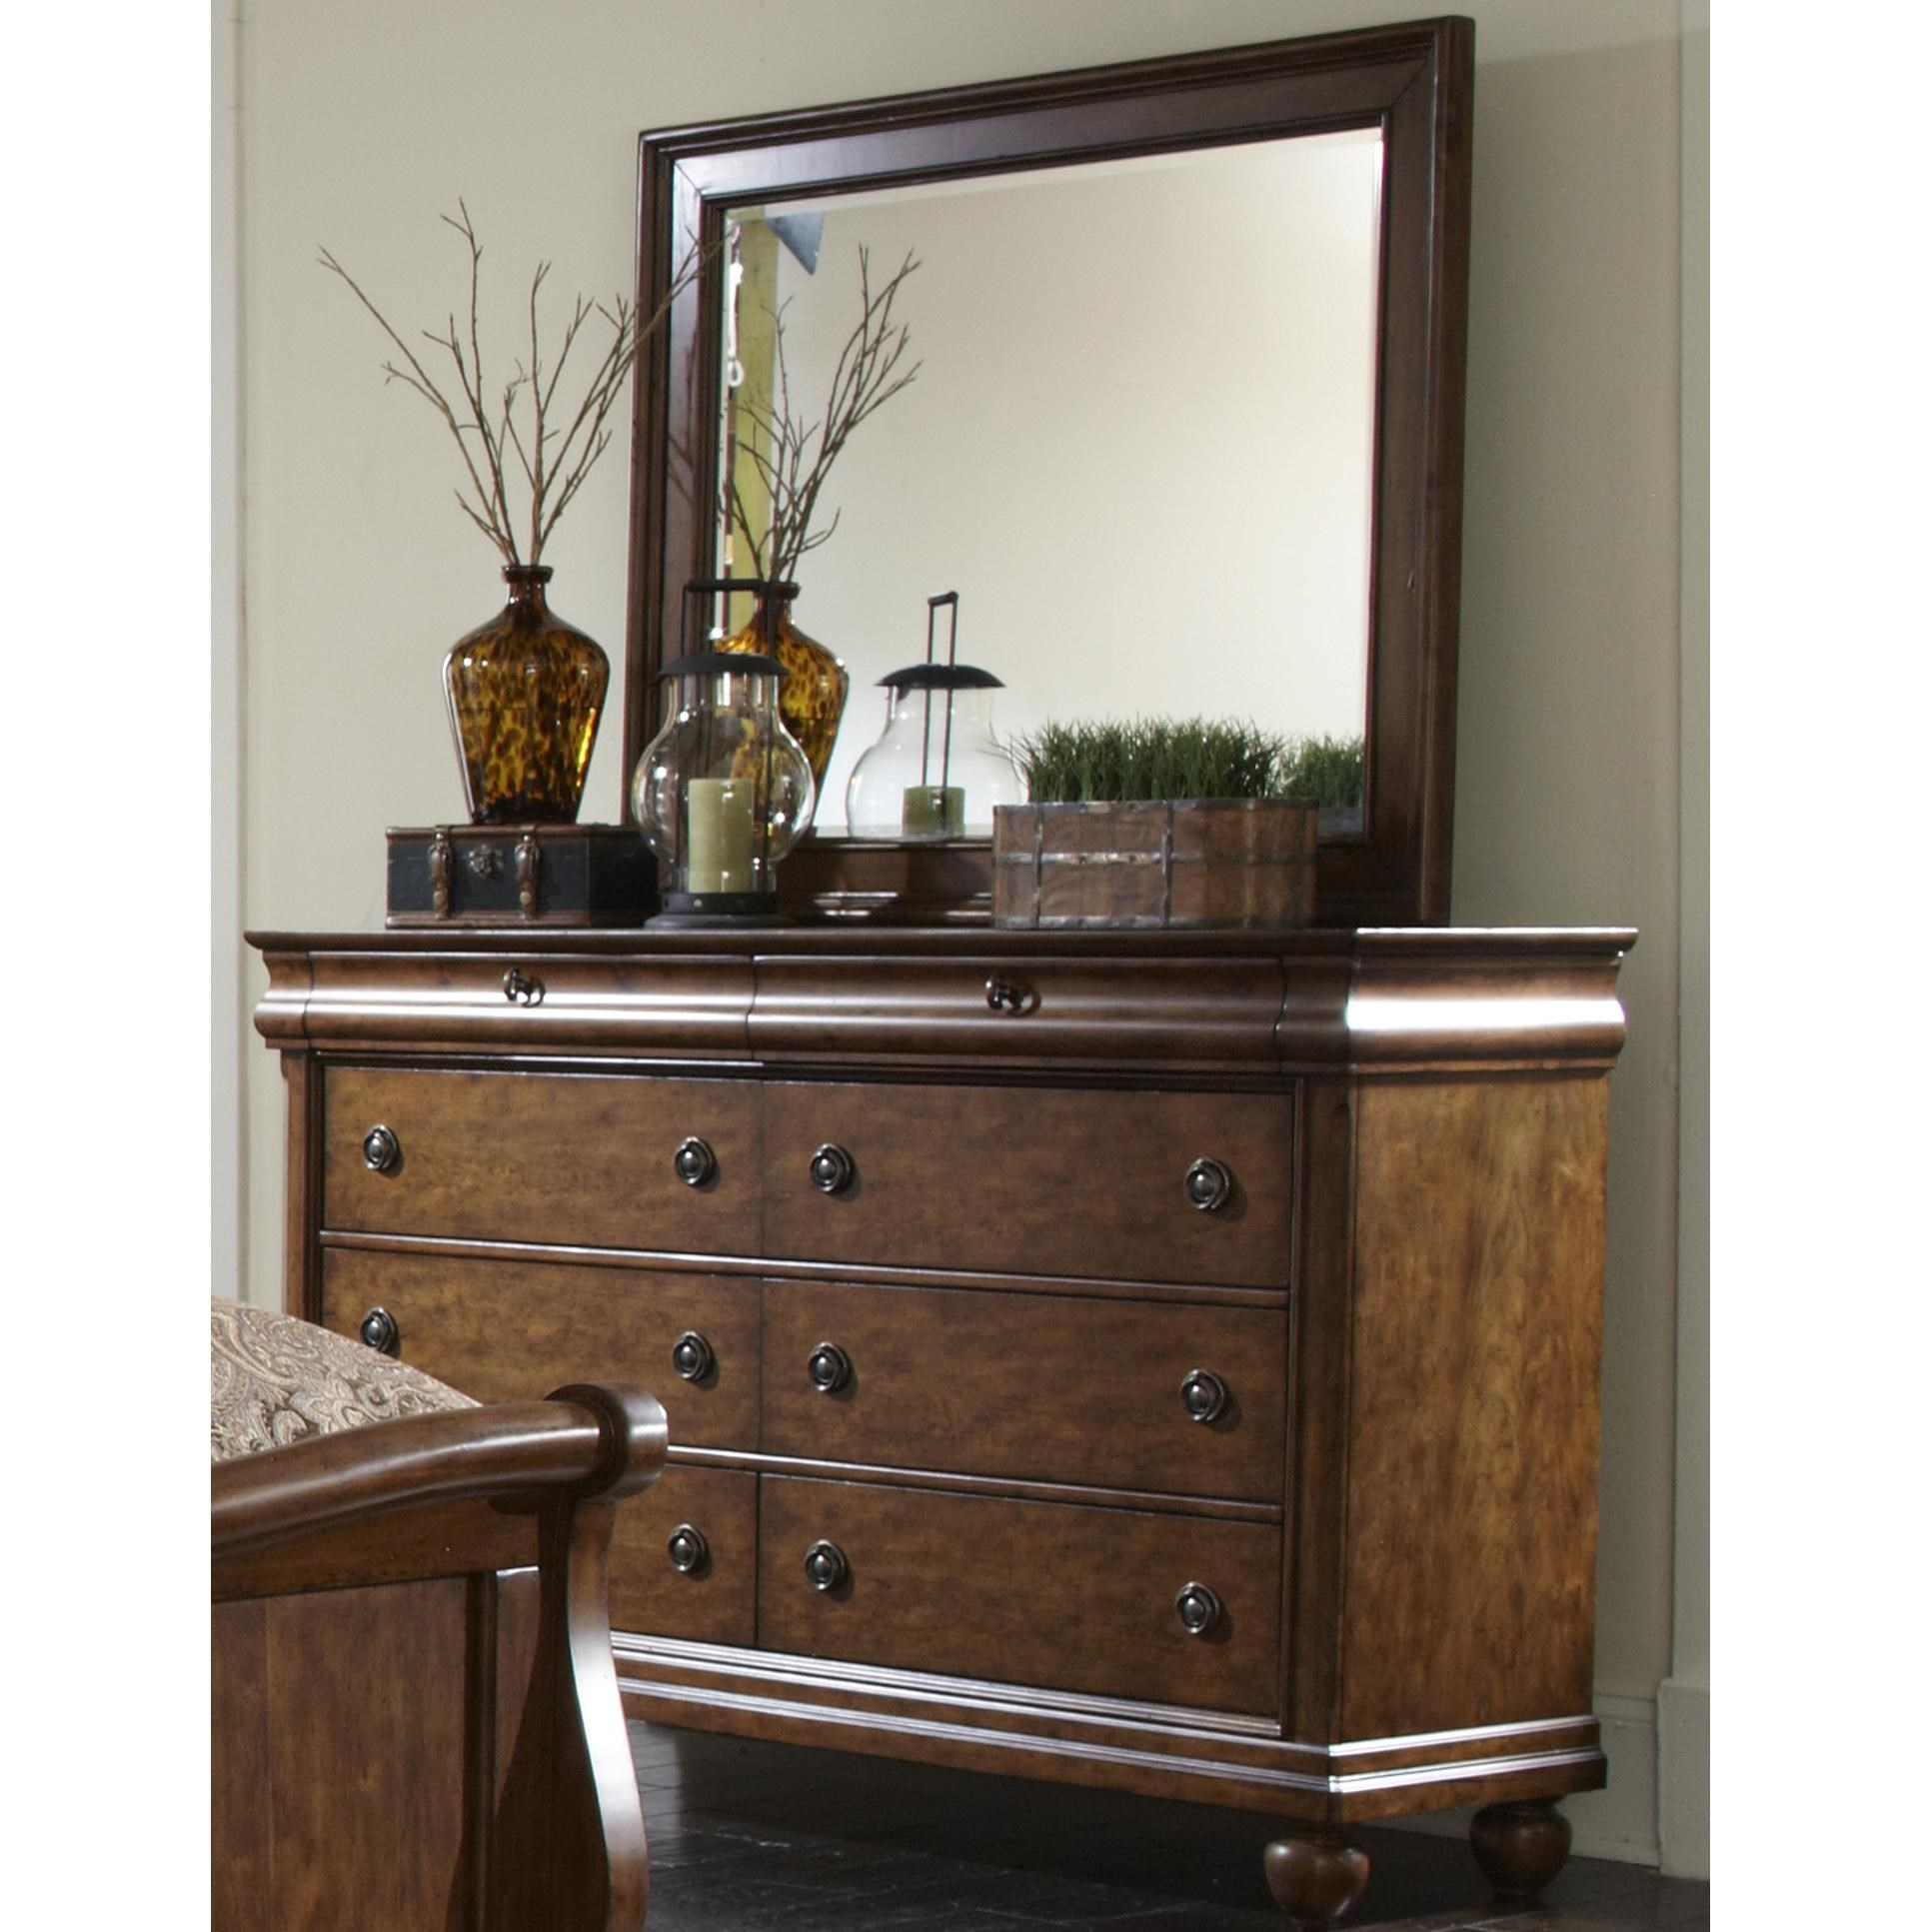 Eight-Drawer Dresser with Wood-Framed Landscape Mirror